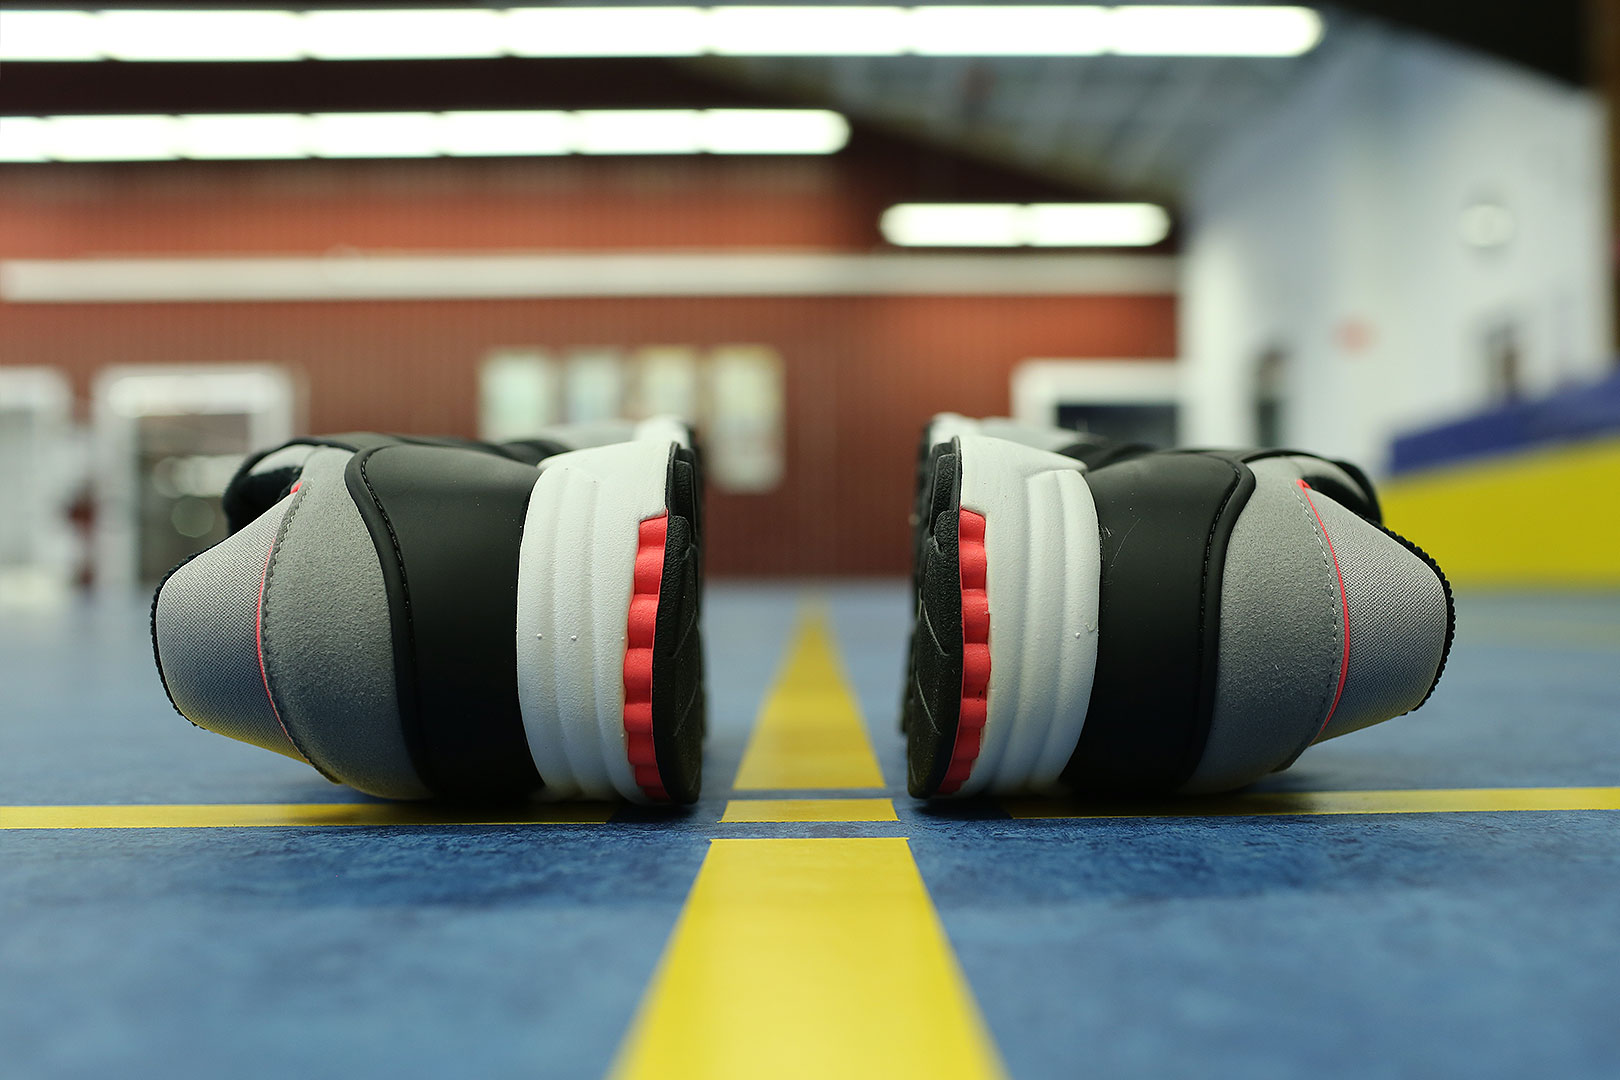 Rasterfahndung auf dem Badminton Court im adidas EQT Support RF